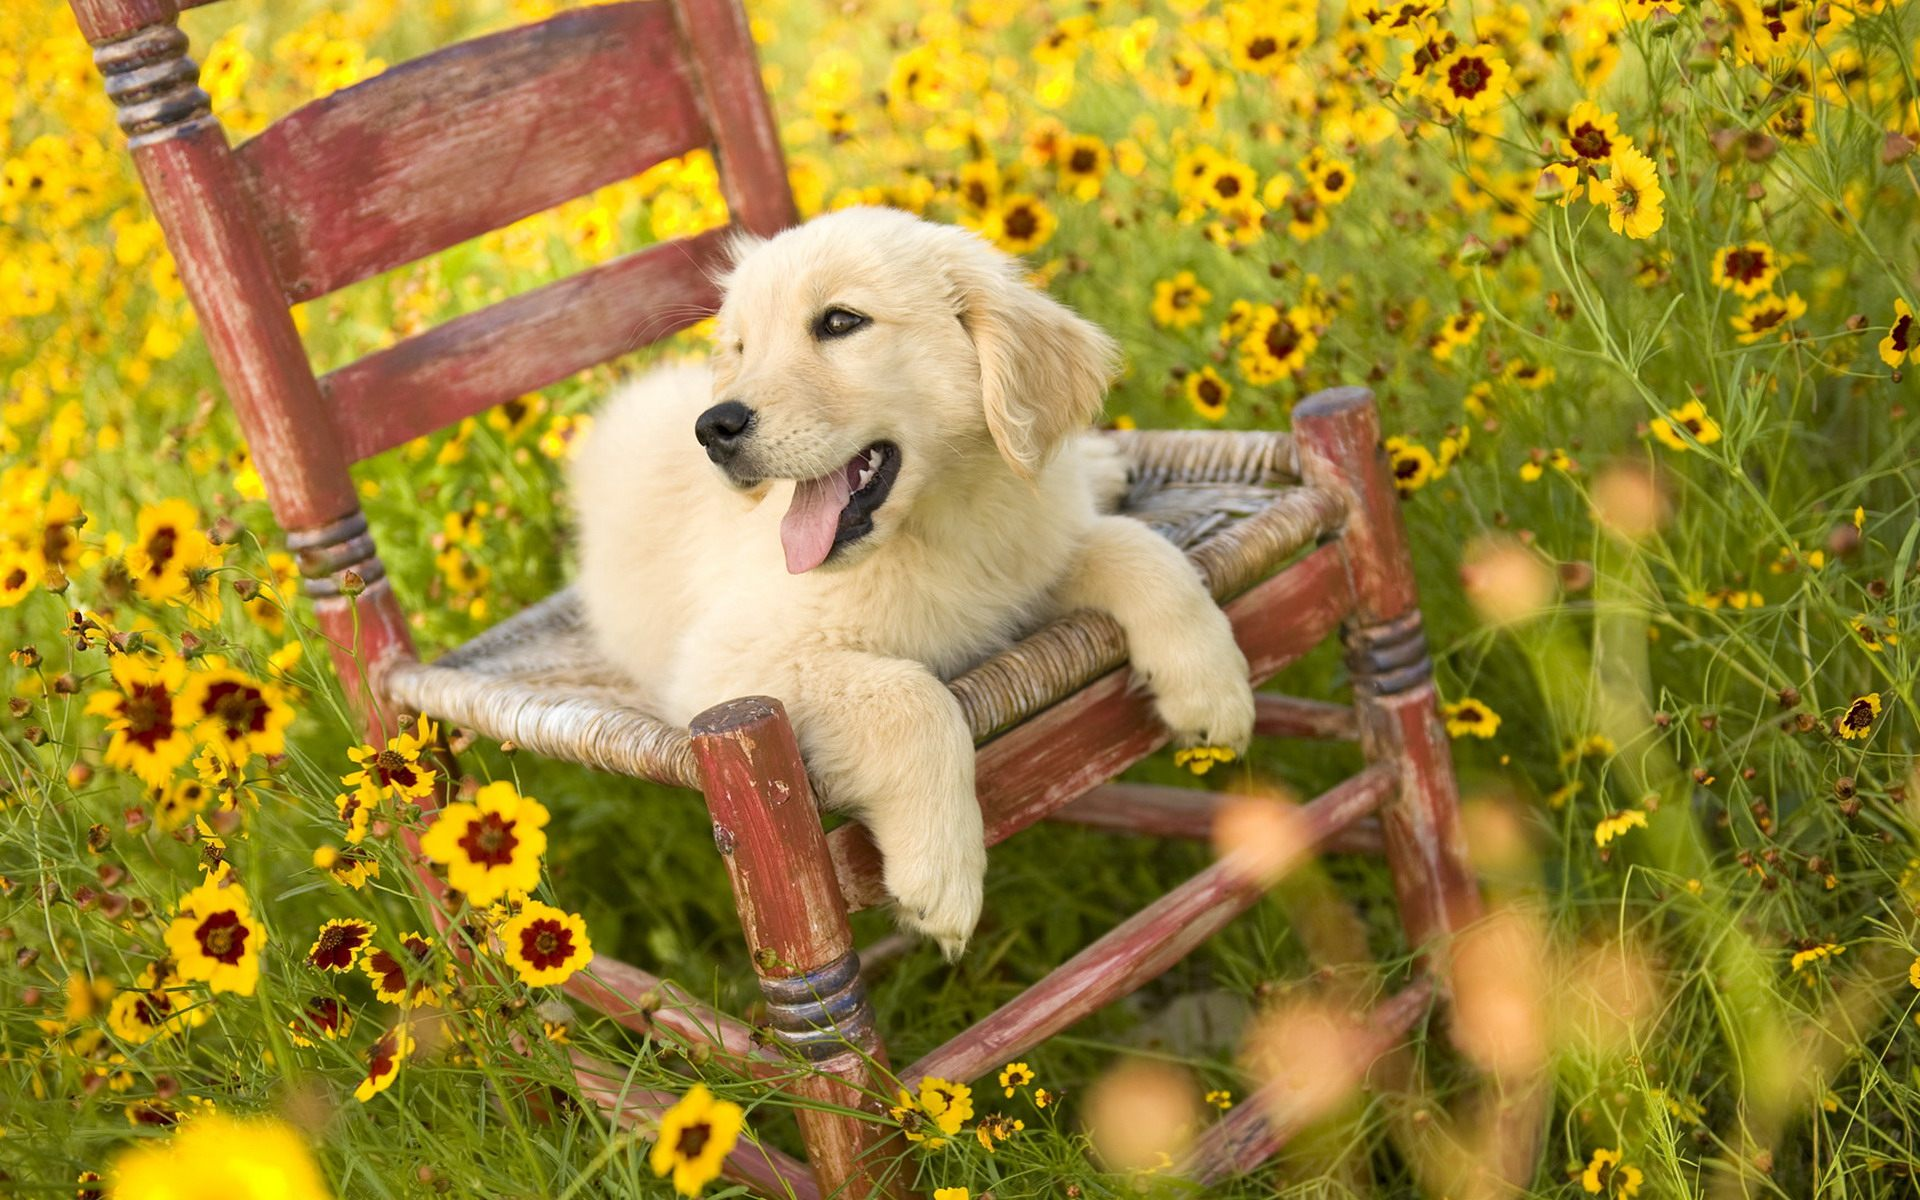 Golden Retriever Cute Puppy Wallpapers in HD for Desktop 1920x1200